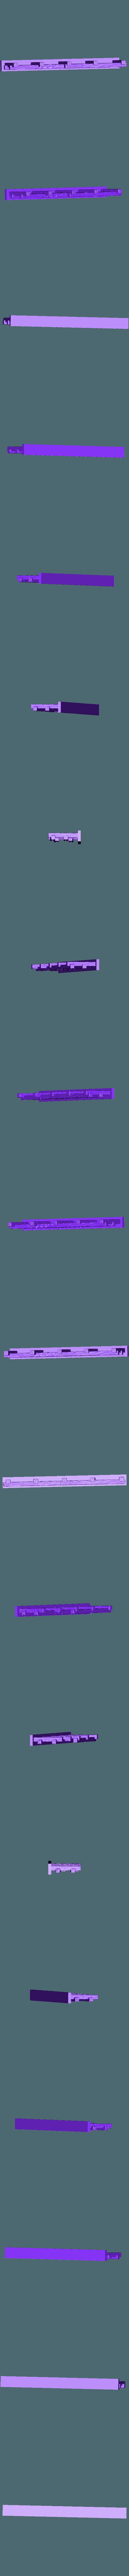 fence_2.stl Download free STL file Fence miniatures • 3D printing model, Ilhadiel